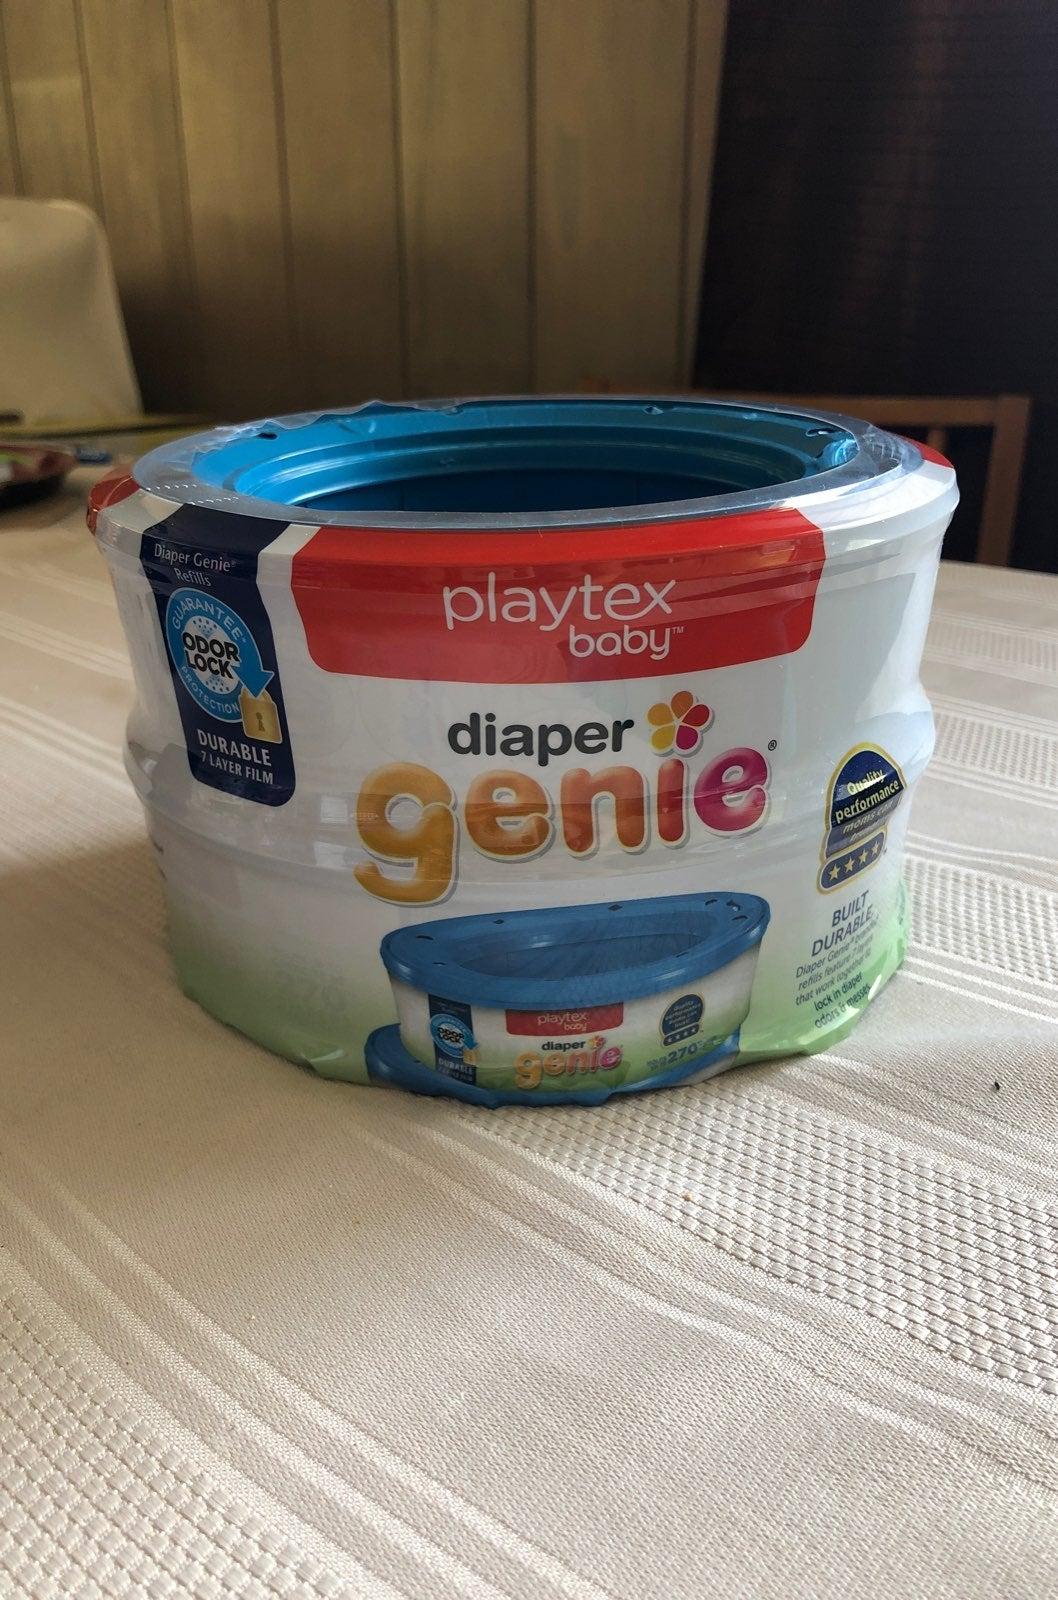 Diaper Genie Refill - set of 2